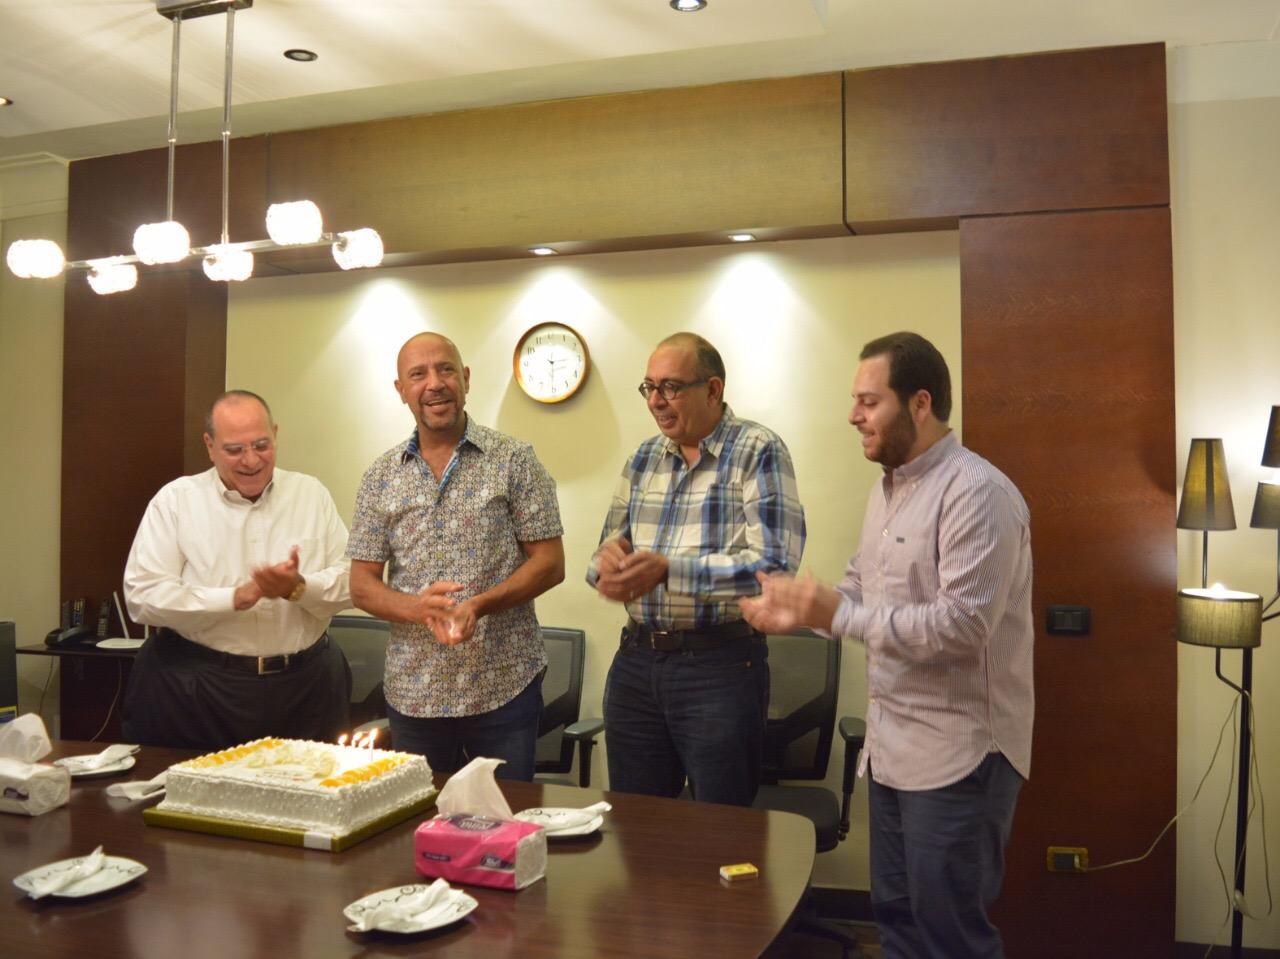 اشرف عبد الباقى يحتفل بعيد ميلاده مع صادق الصباح ونجله انور